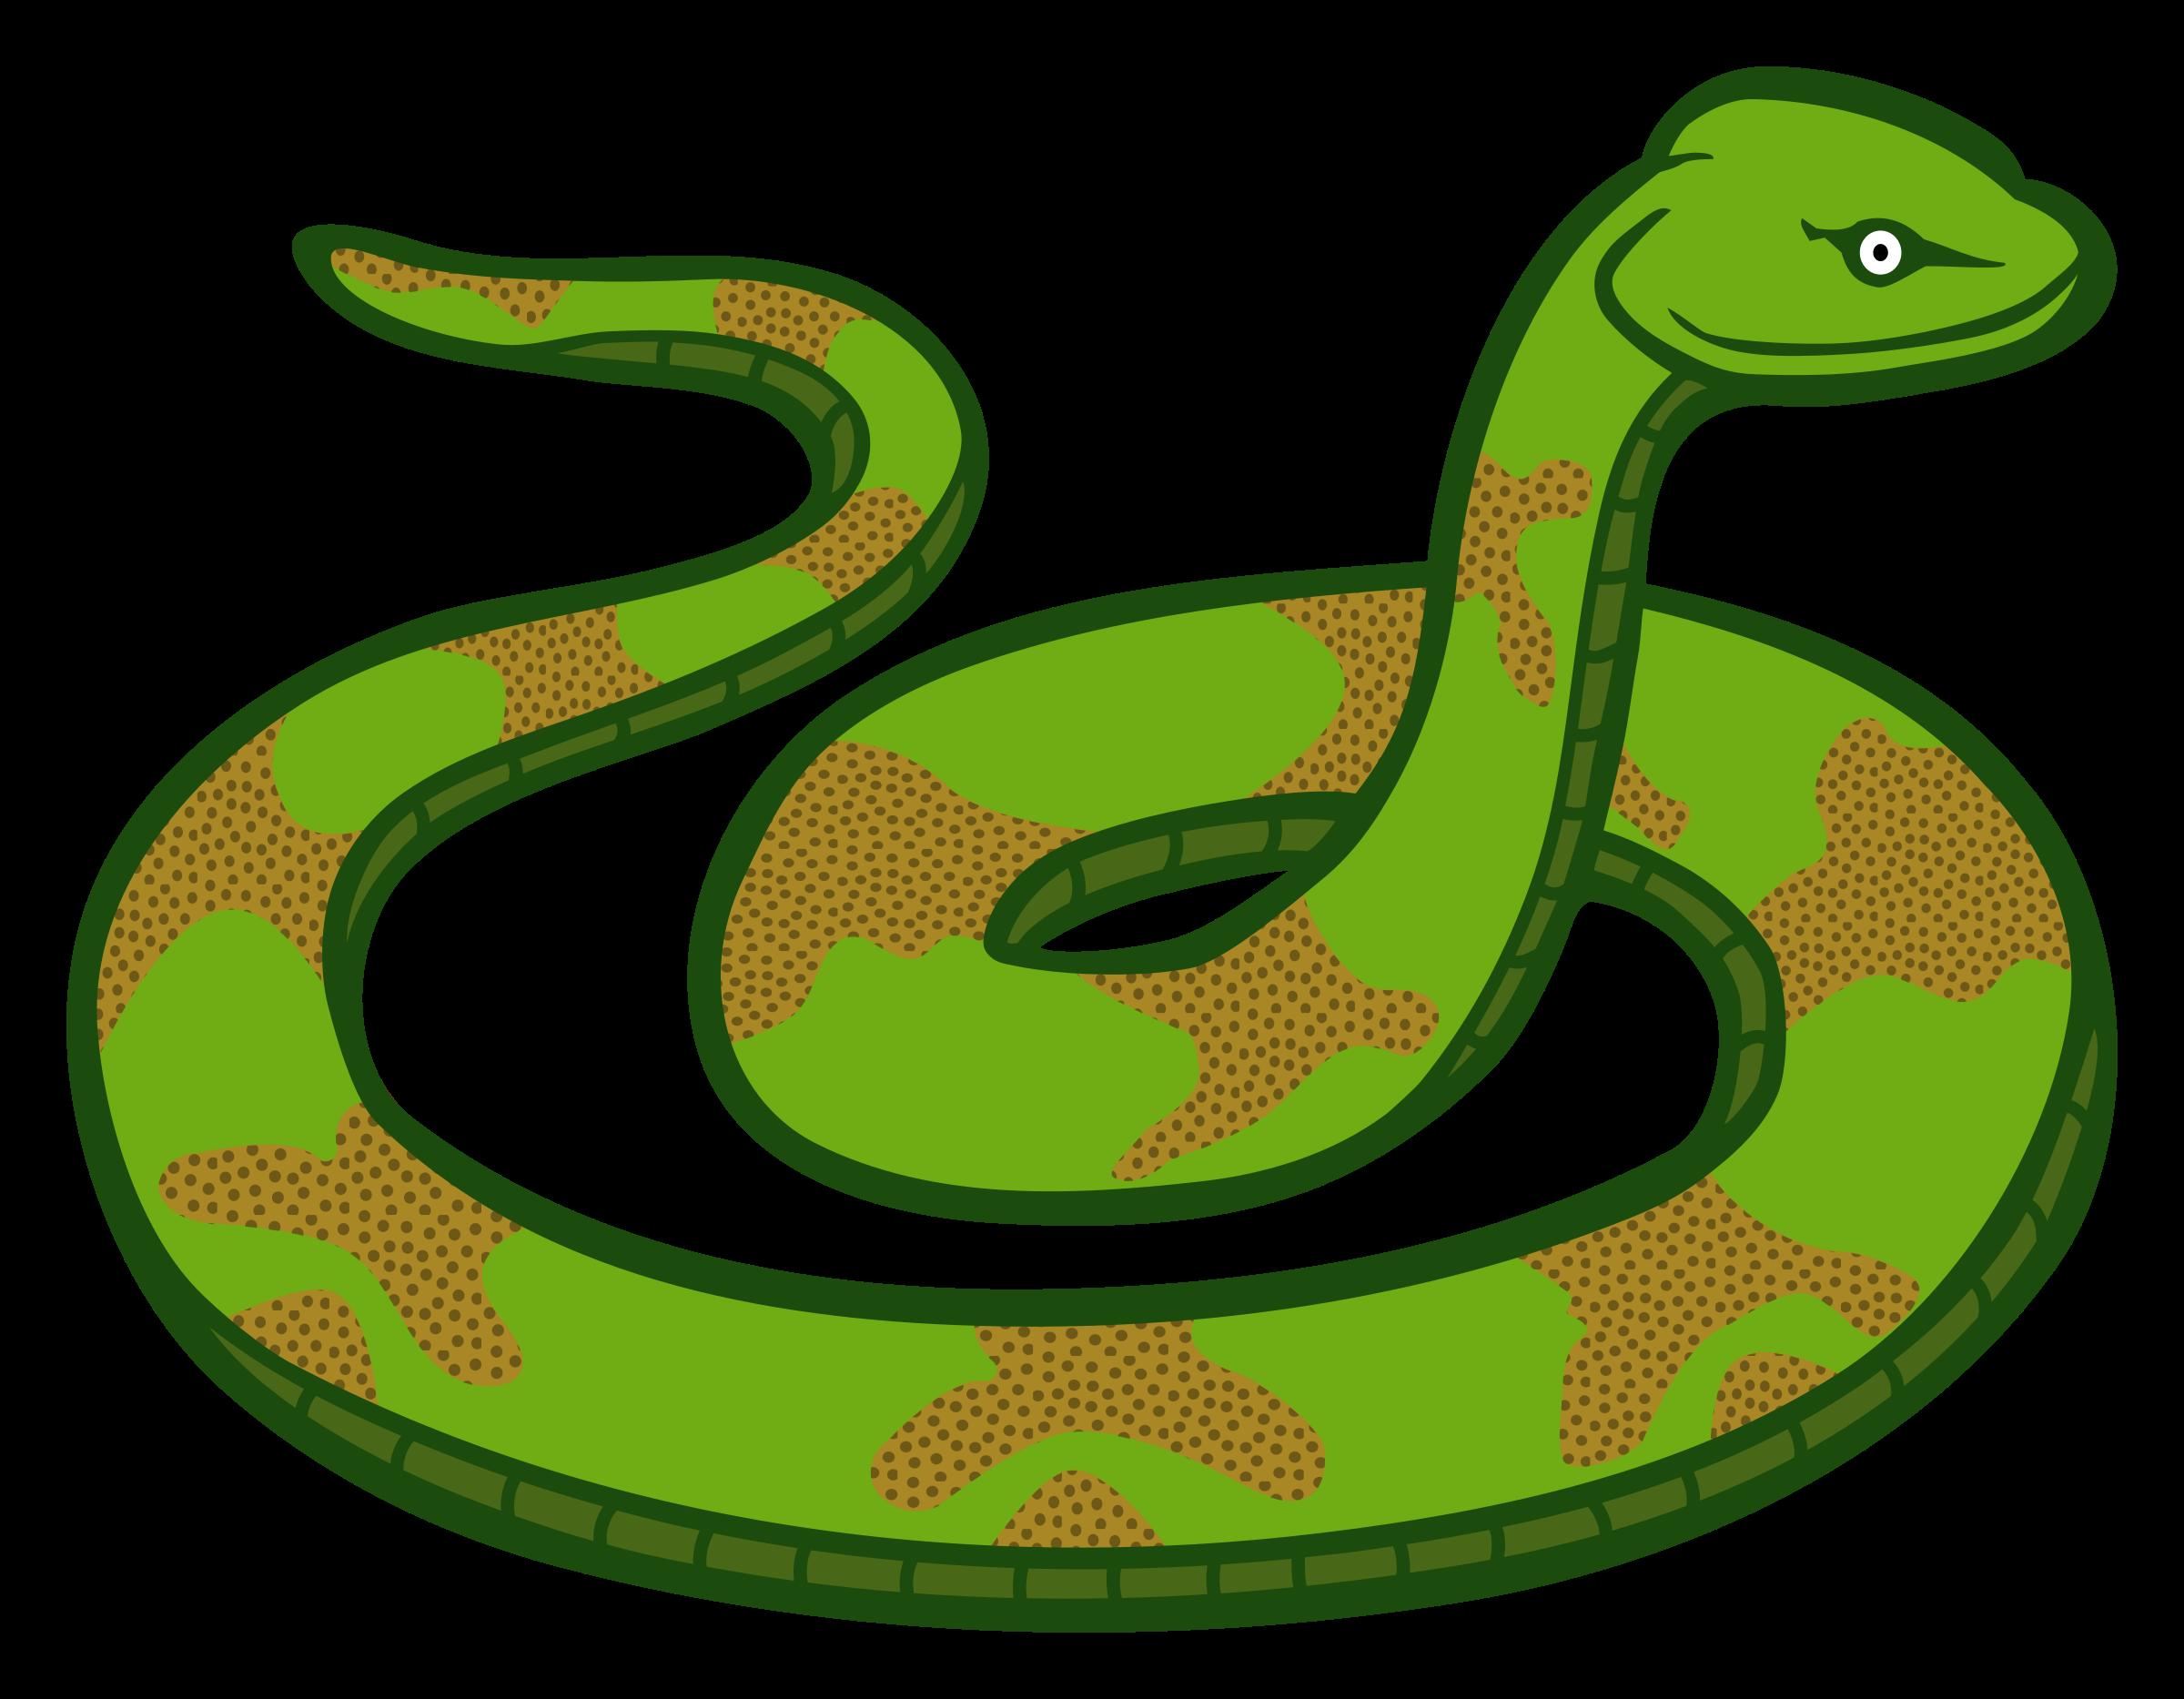 Transparent snake clipart 2-Transparent snake clipart 2-13